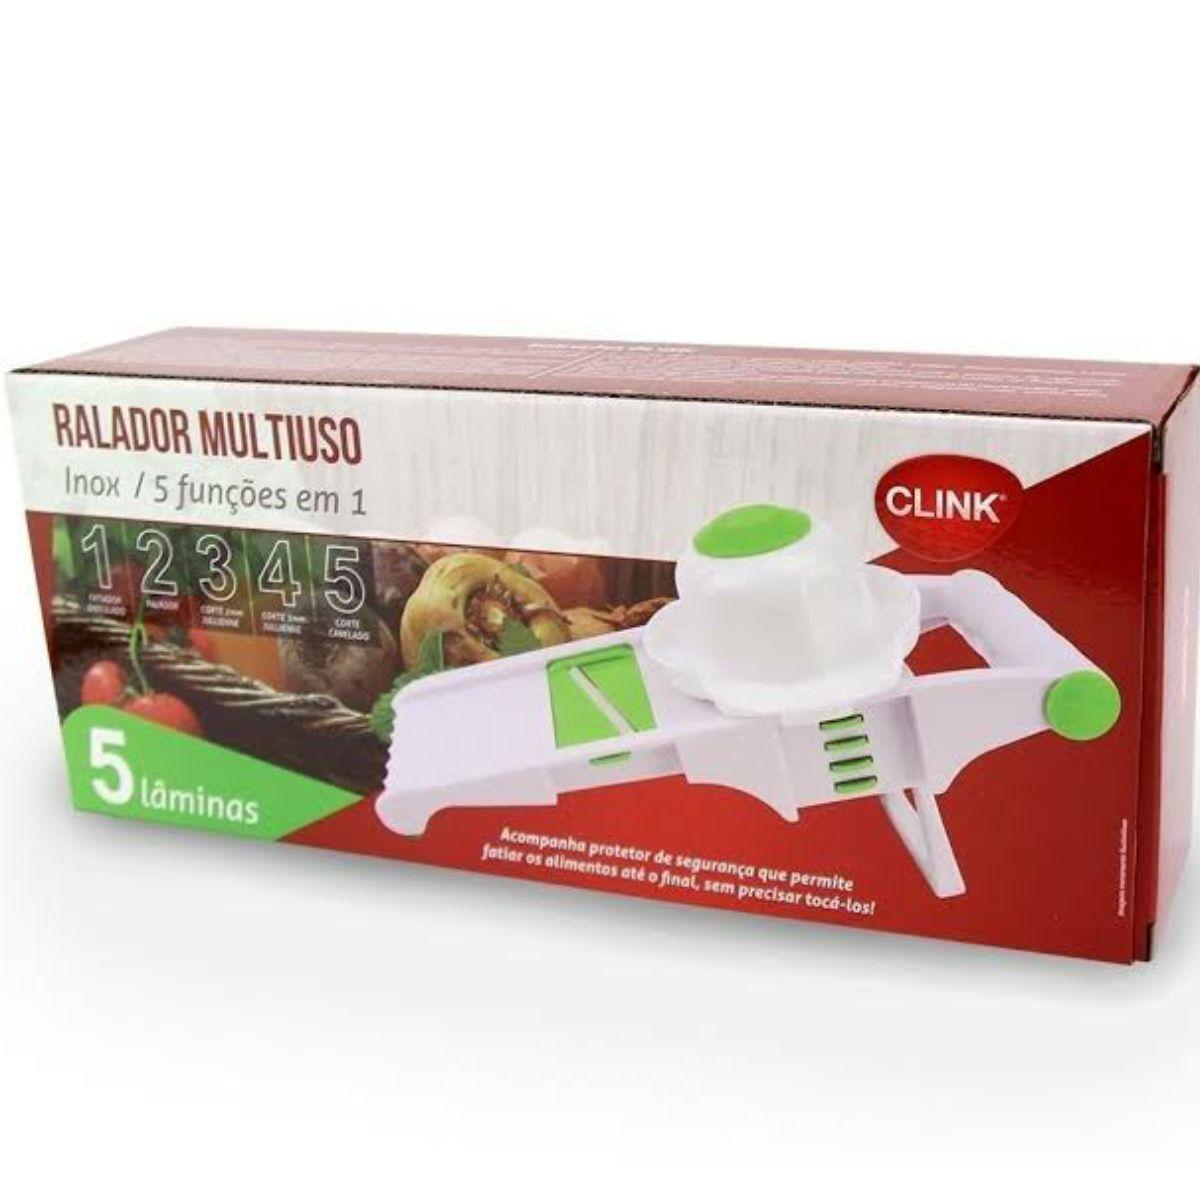 Kit Ralador Multiuso 5 em 1 - 5 Laminas